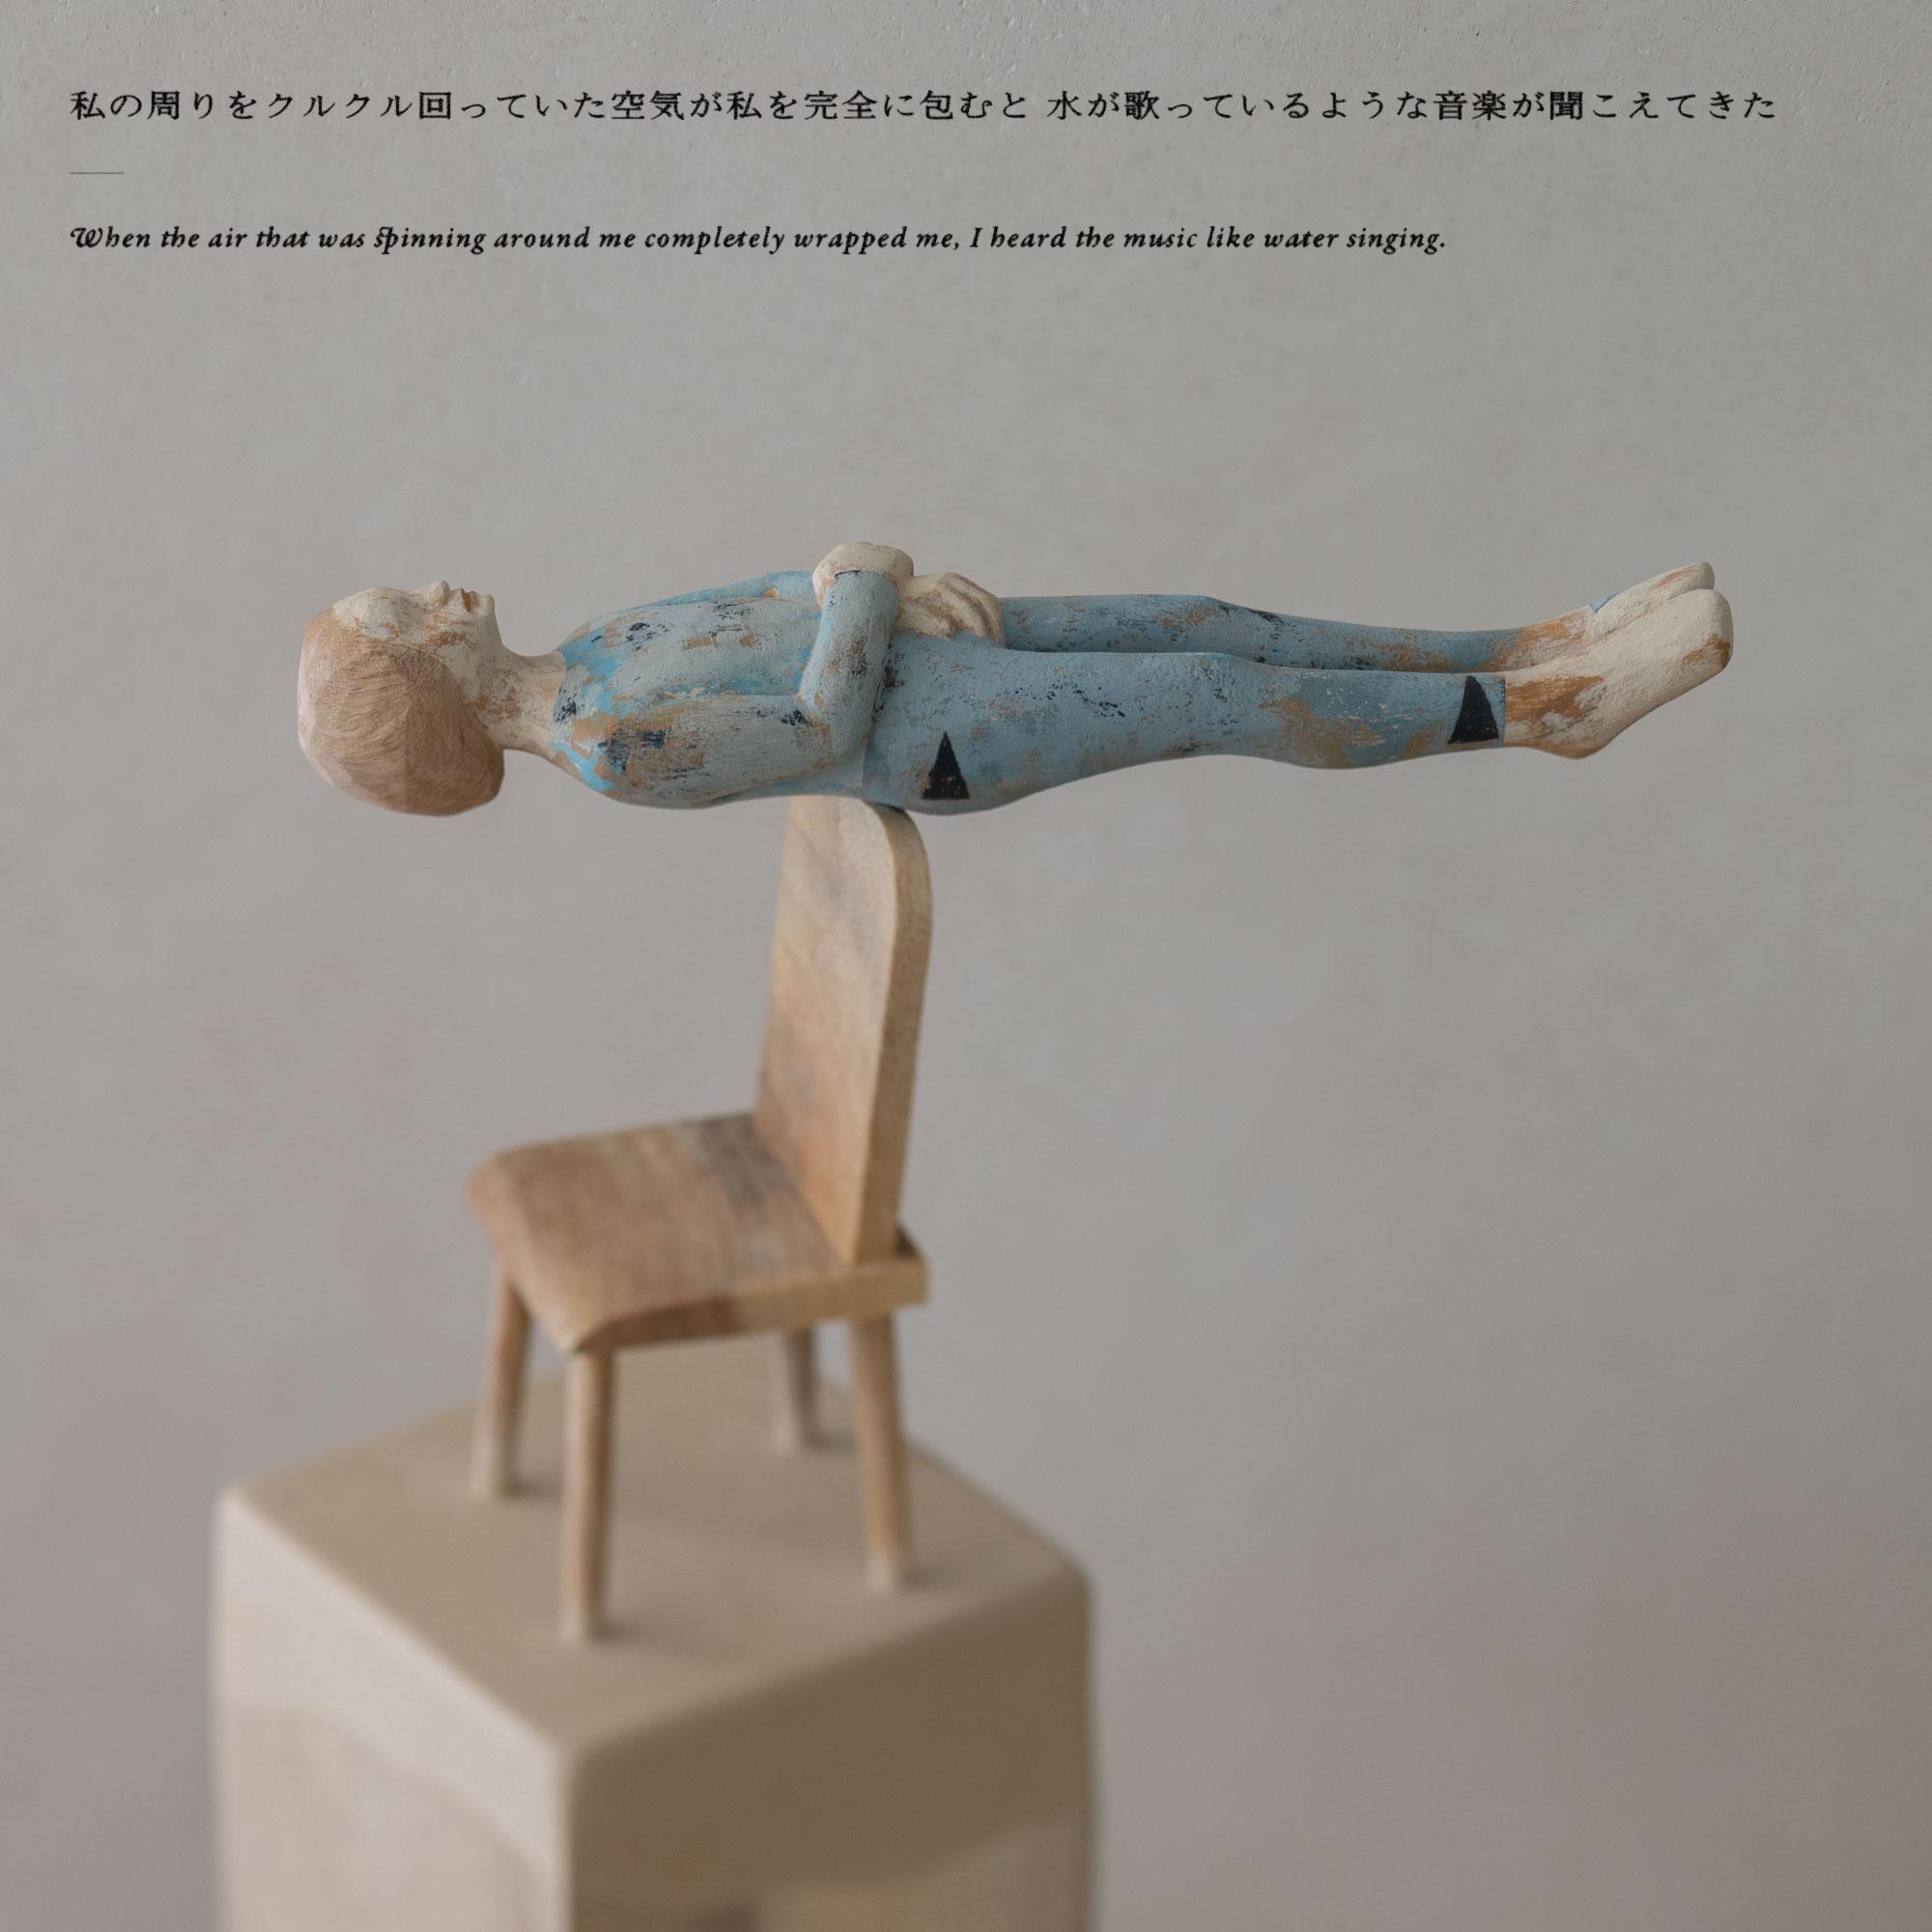 "Yuta NISHIURA ""動 Motion"" #08 Aug. 2020 「私の周りをクルクル回っていた空気が私を完全に包むと 水が歌っているような音楽が聞こえてきた」"